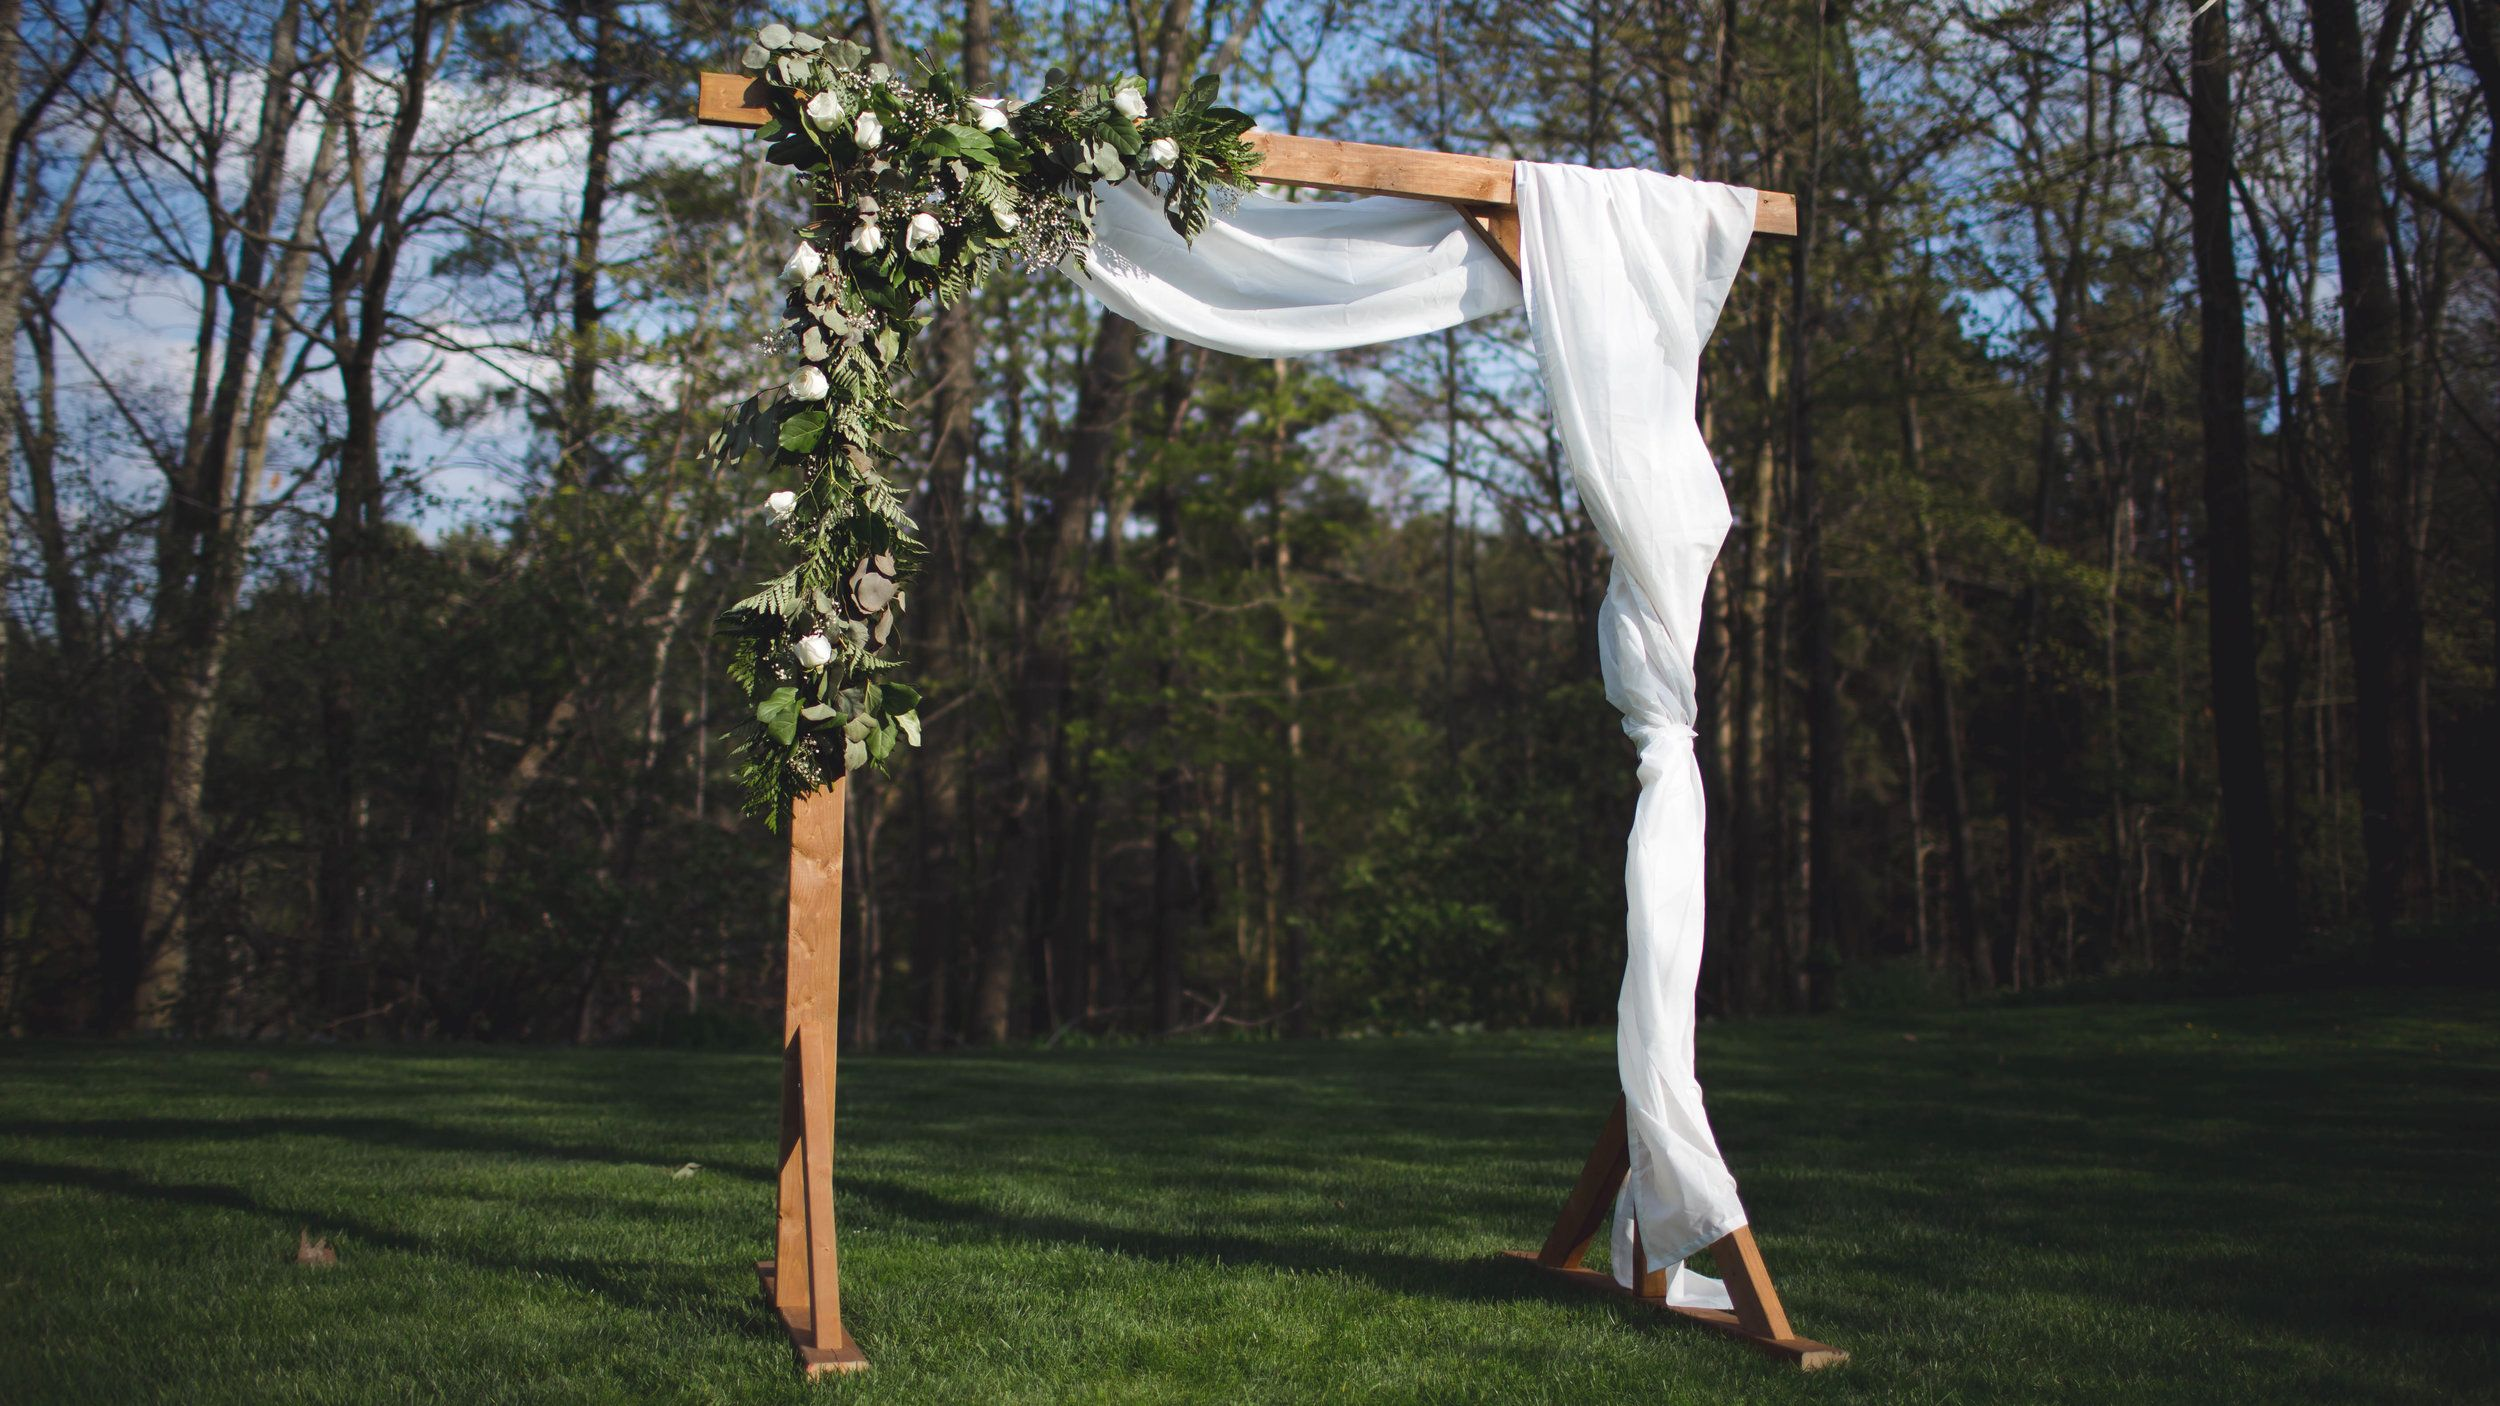 Diy wood wedding arbor diy wedding arbor wood wedding